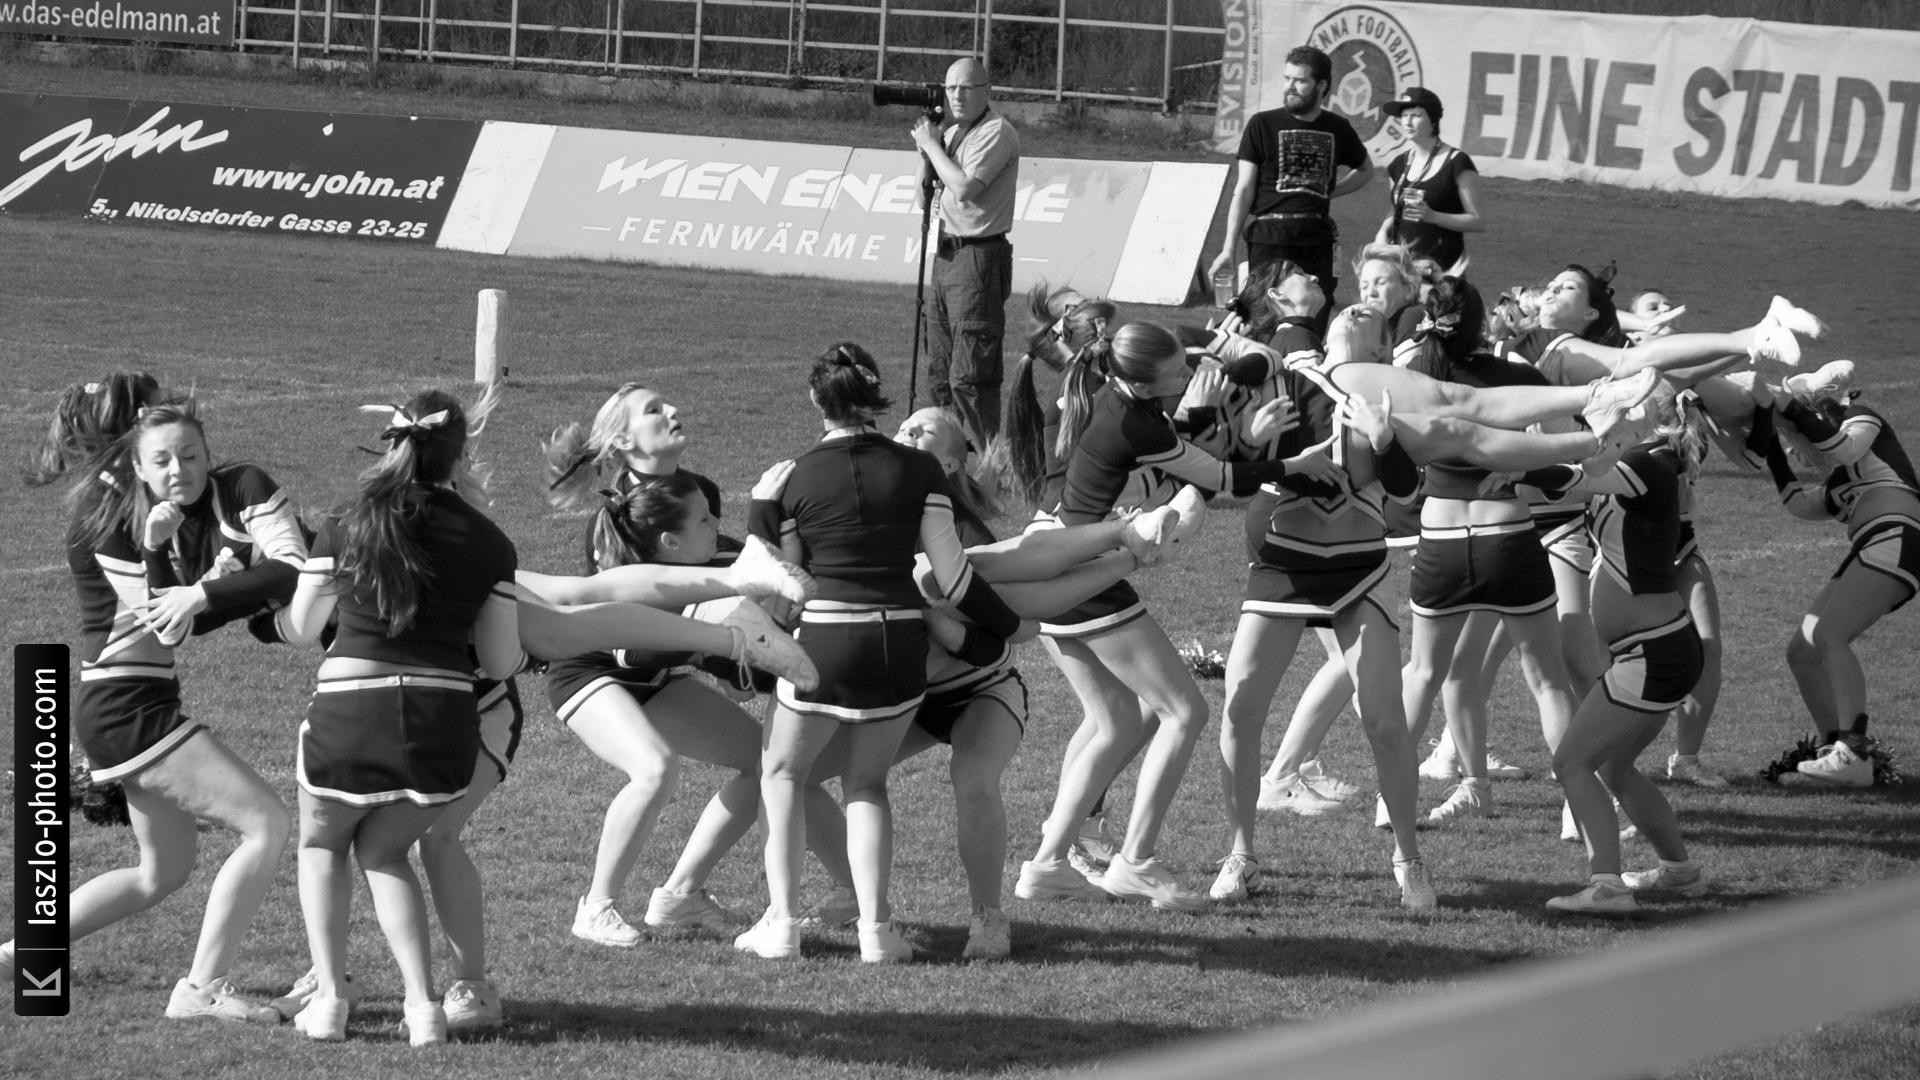 Sideline Impressions, Cheerleaders & more ...